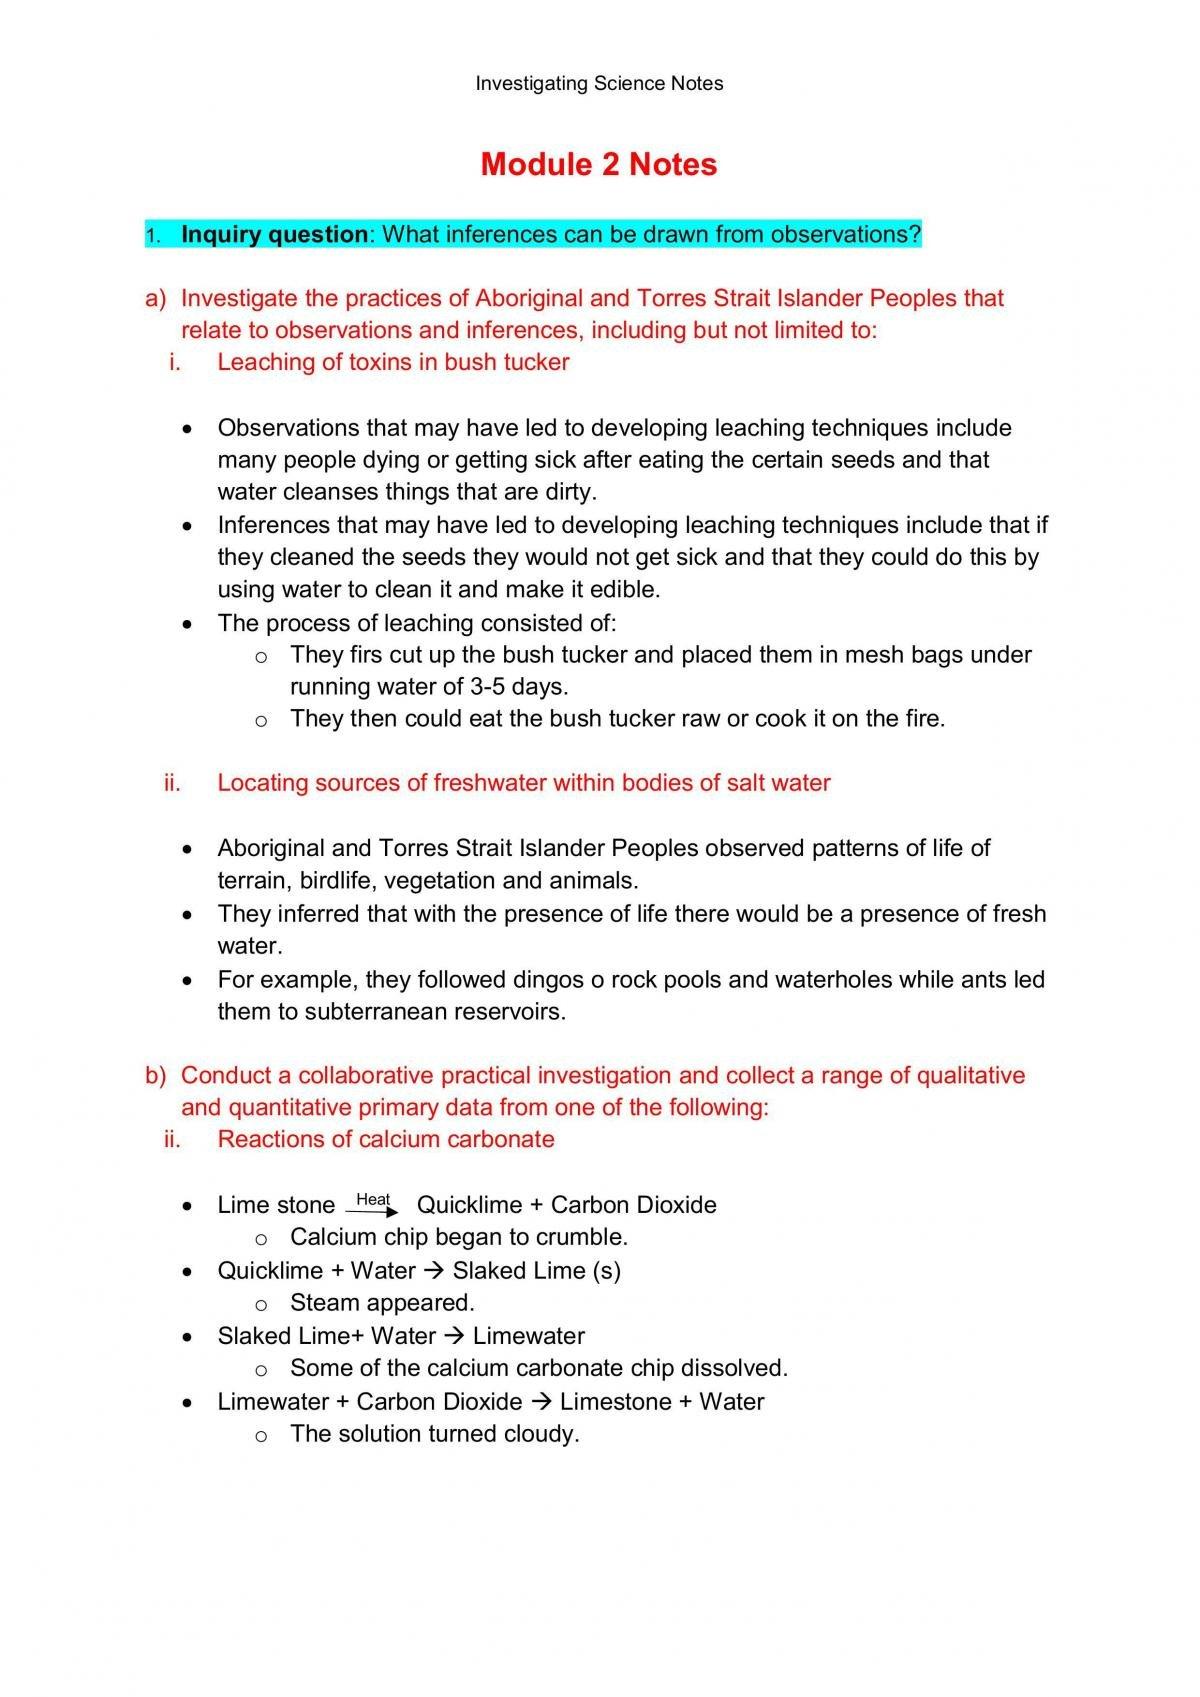 Investigating Science Prelim Notes - Page 5